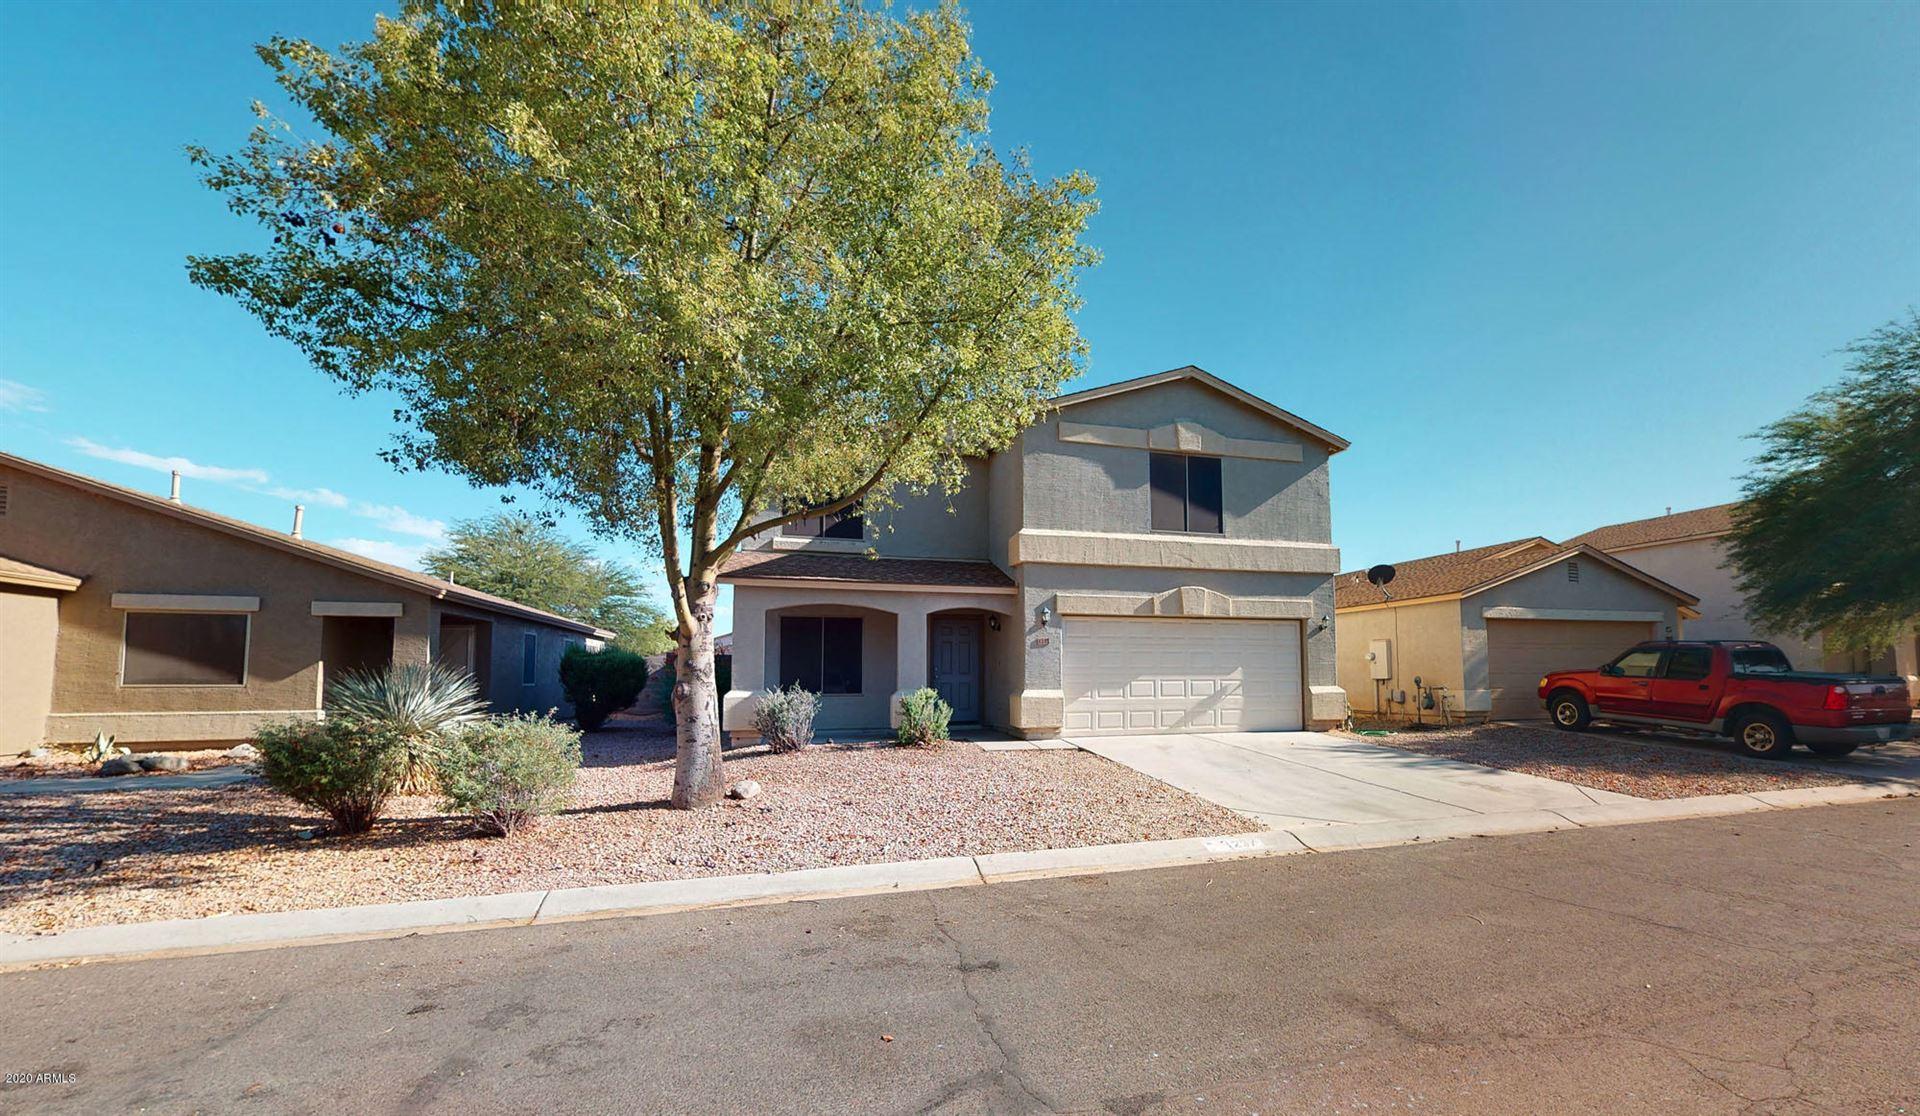 1237 E SILKTASSEL Trail, San Tan Valley, AZ 85143 - #: 6099814